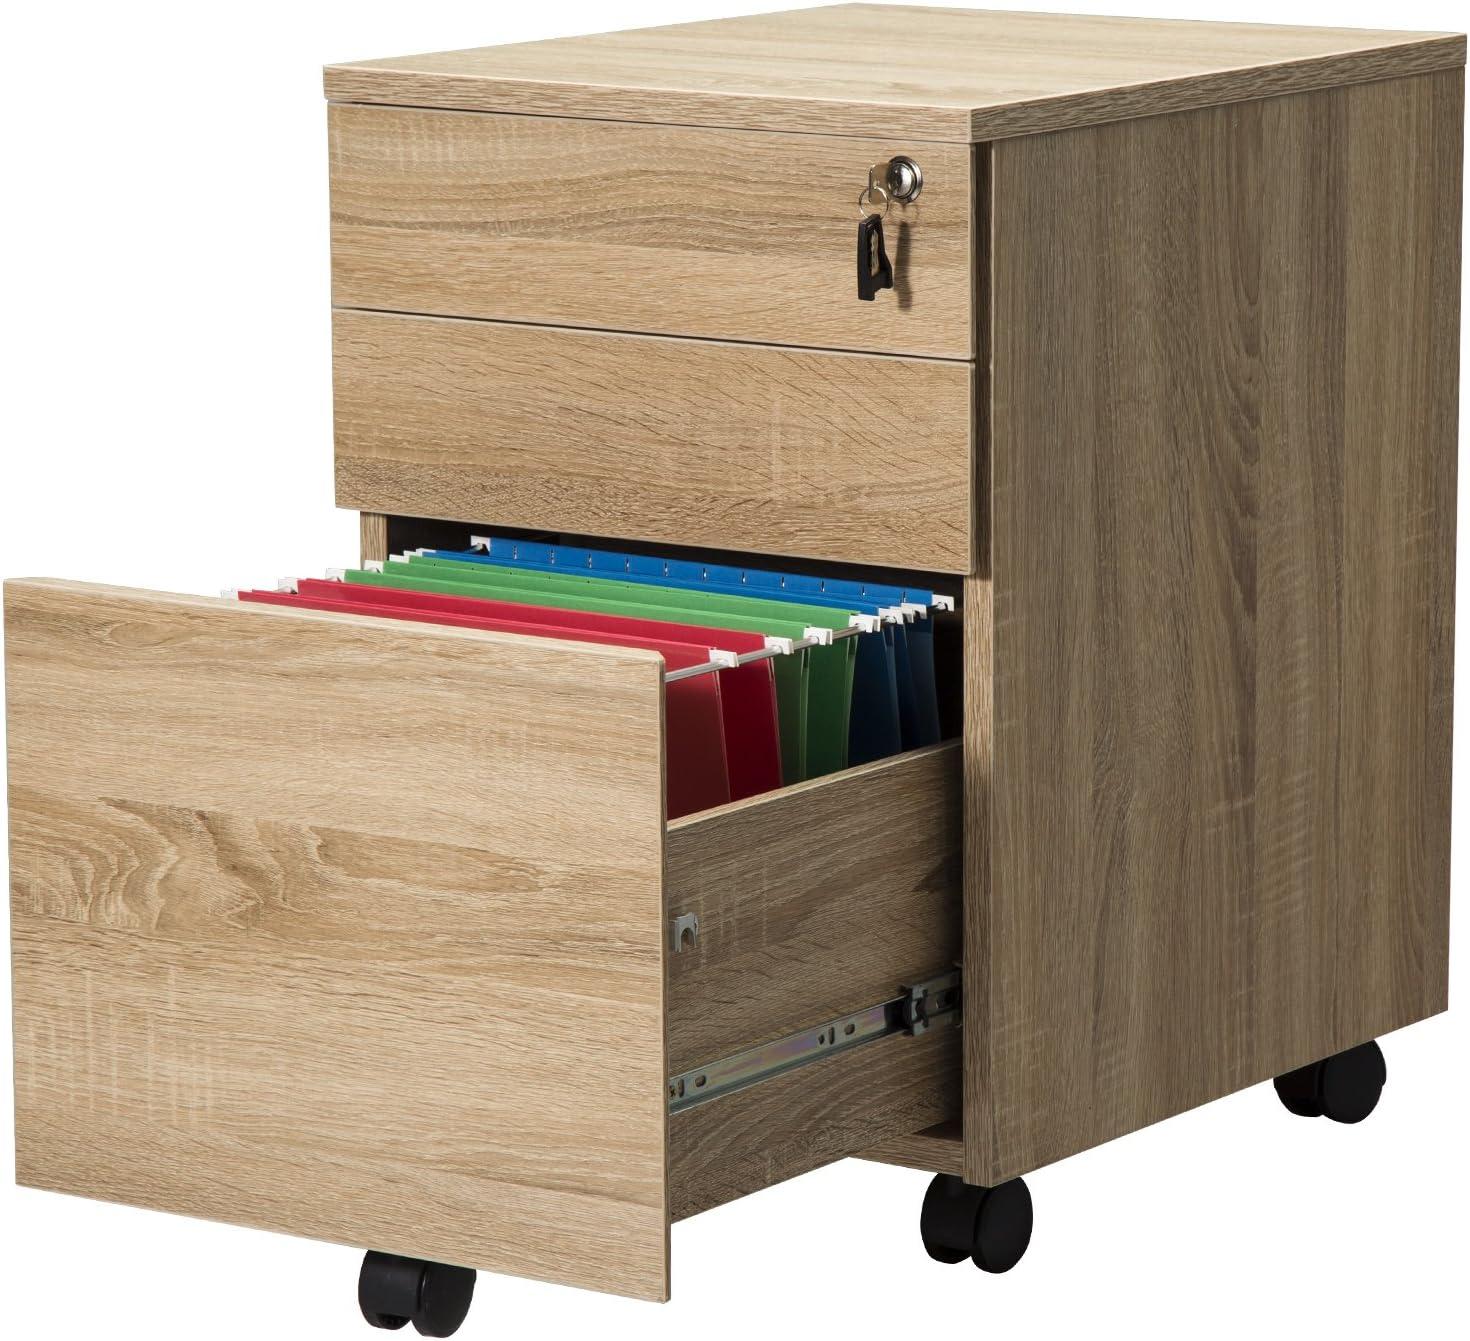 Oak TOPSKY 3 Drawer Wood Mobile File Cabinet Fully Assembled Except Casters